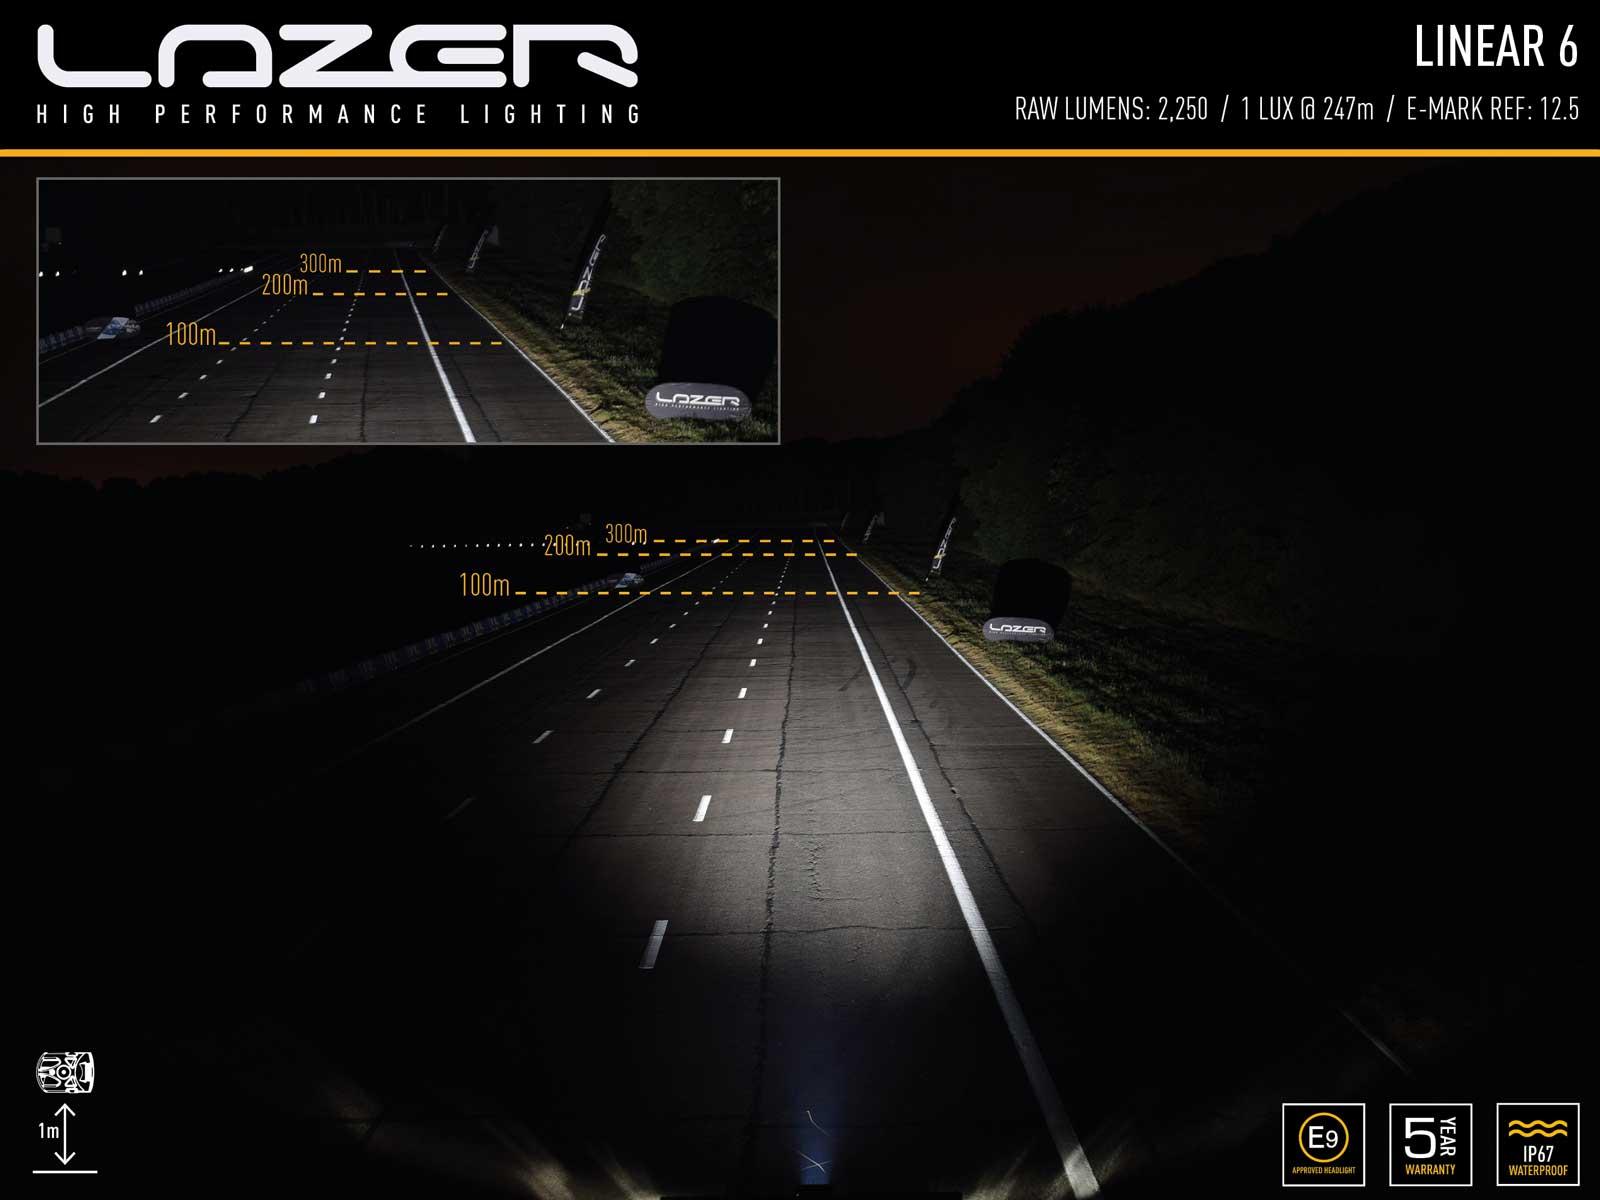 Lazer Linear 6 Standard